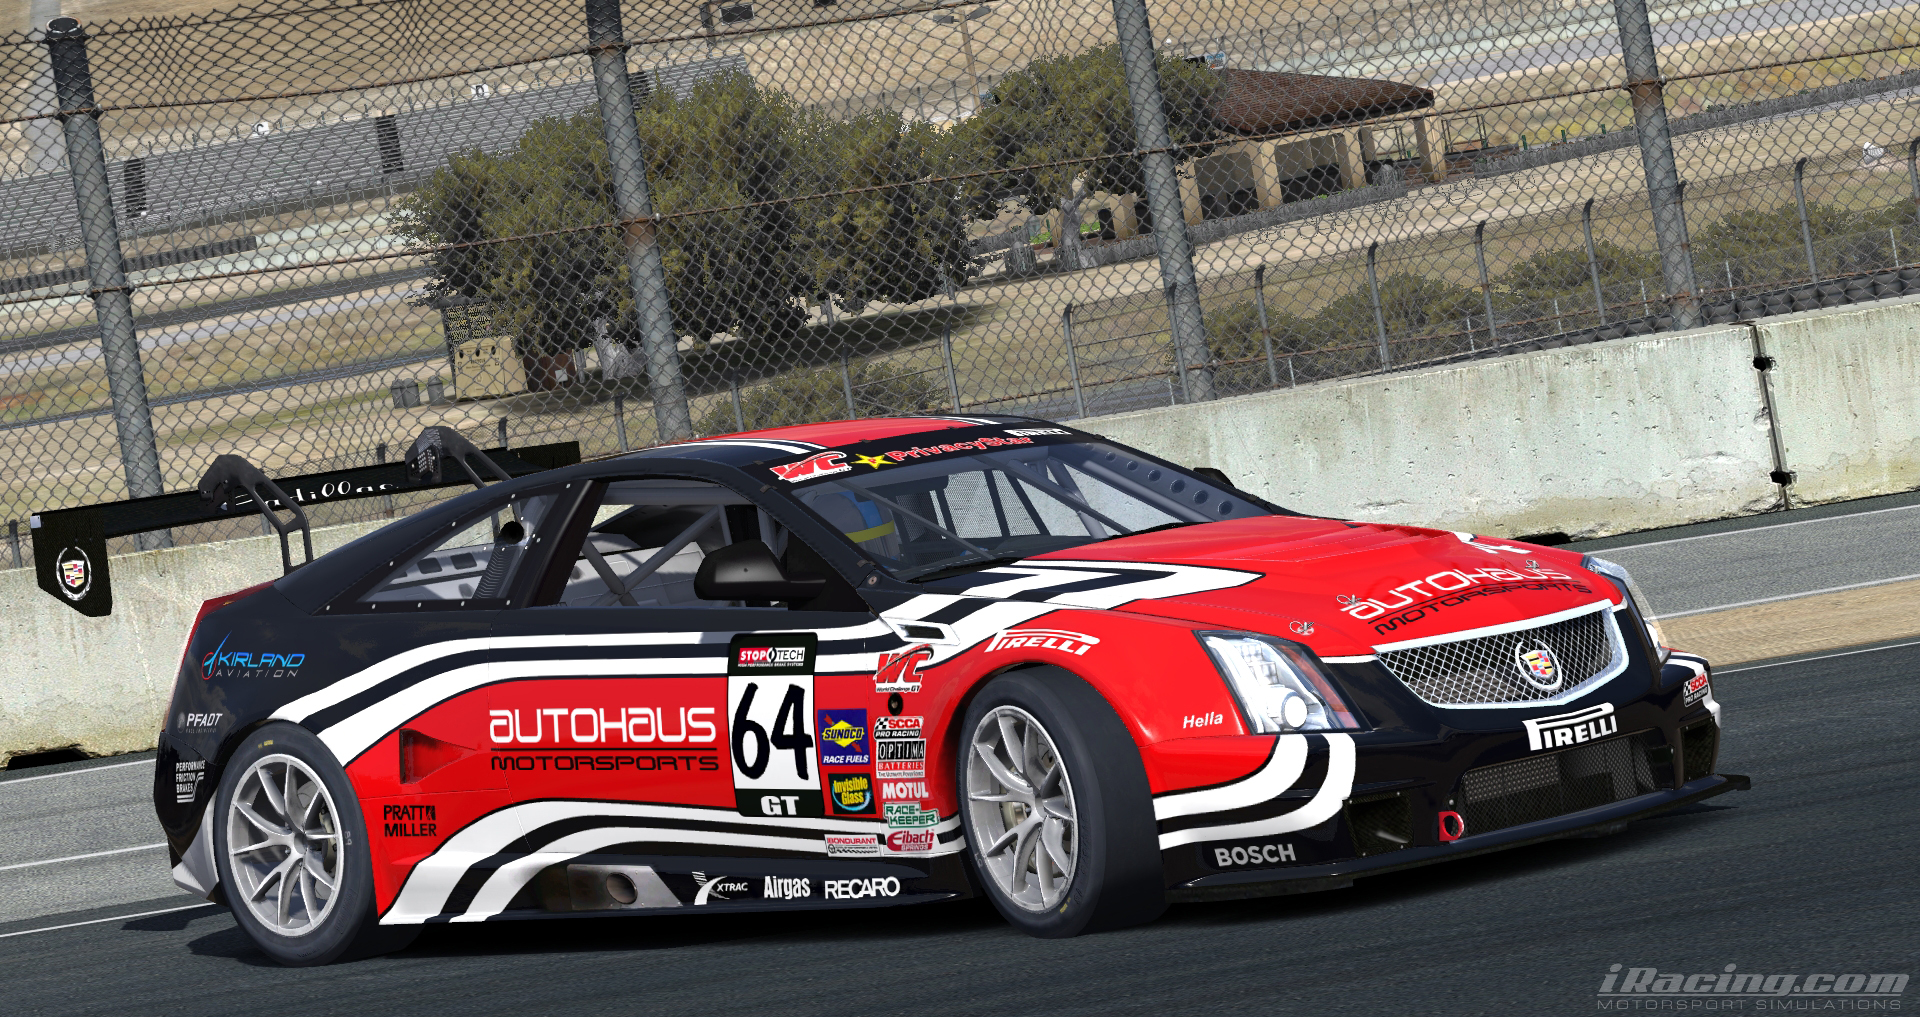 Cadillac CTS-V Racecar @ Laguna Seca